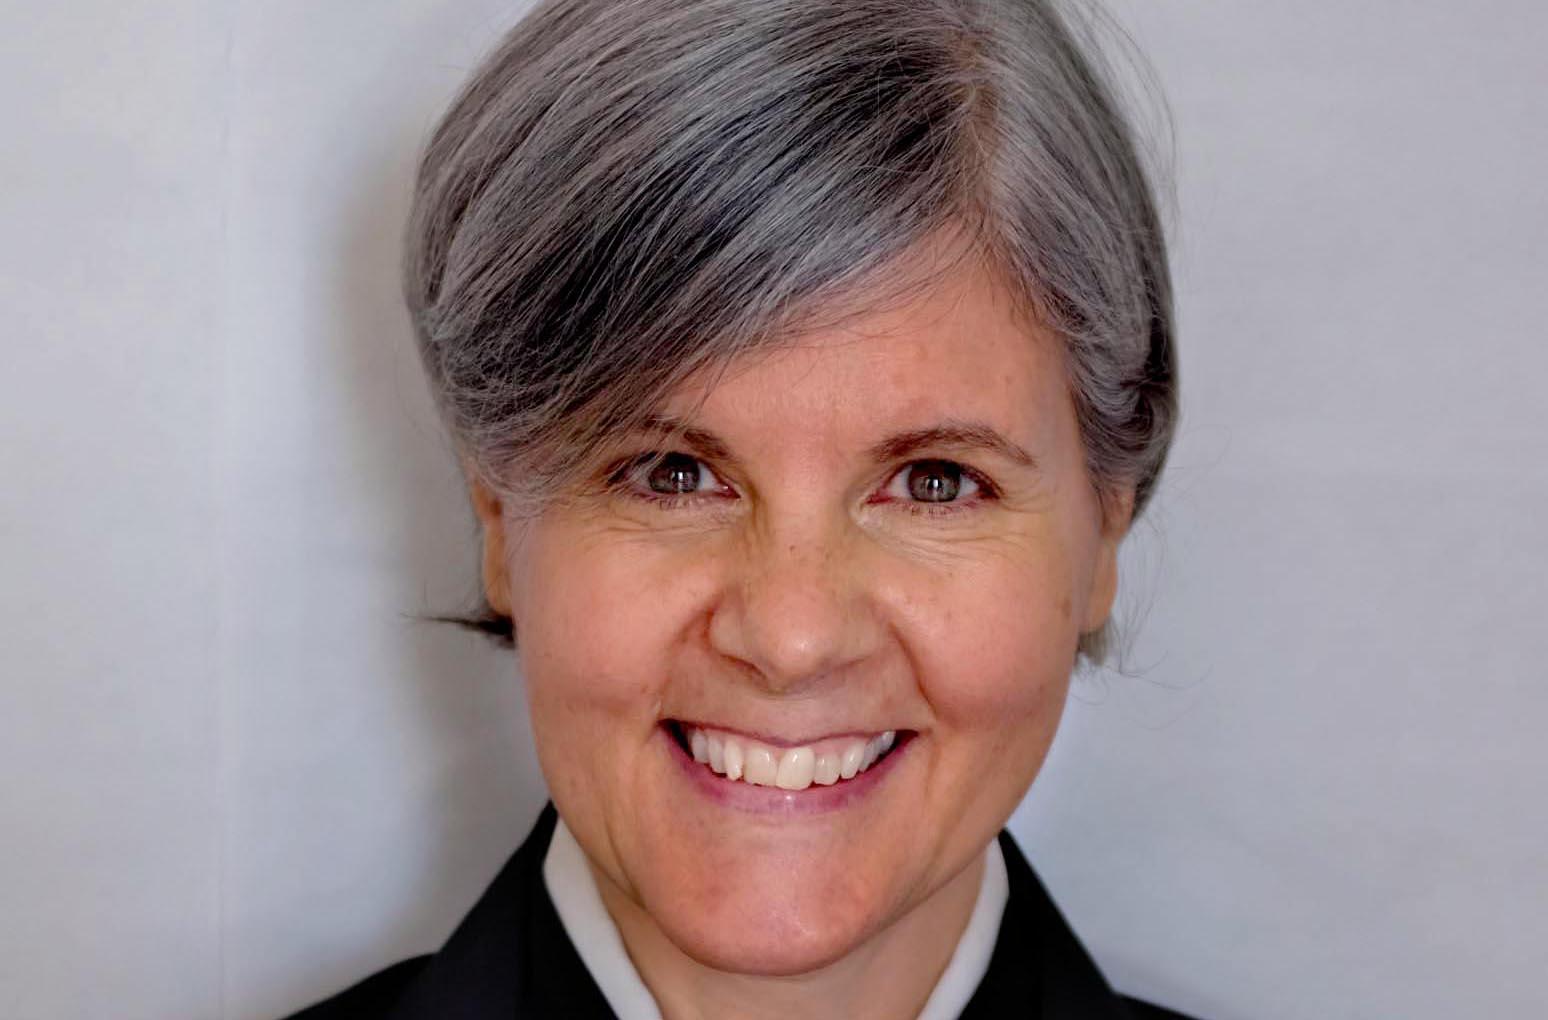 New audio dharma talk by Laura O'Loughlin